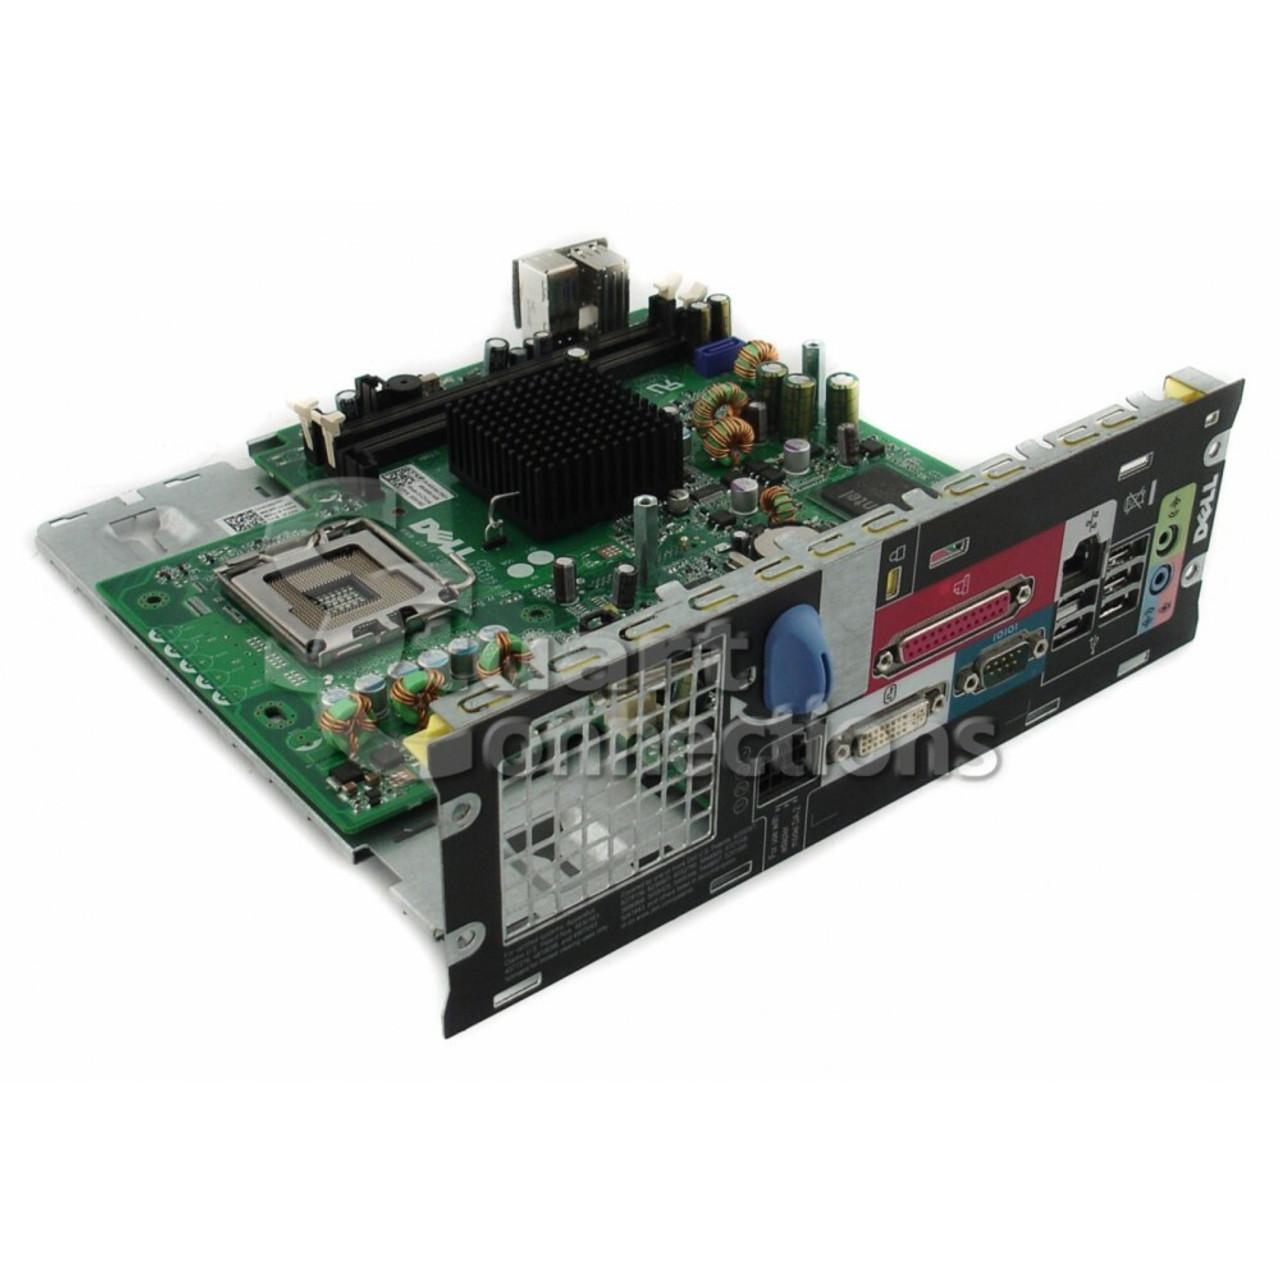 Dell Optiplex 760 Motherboard USFF G919G